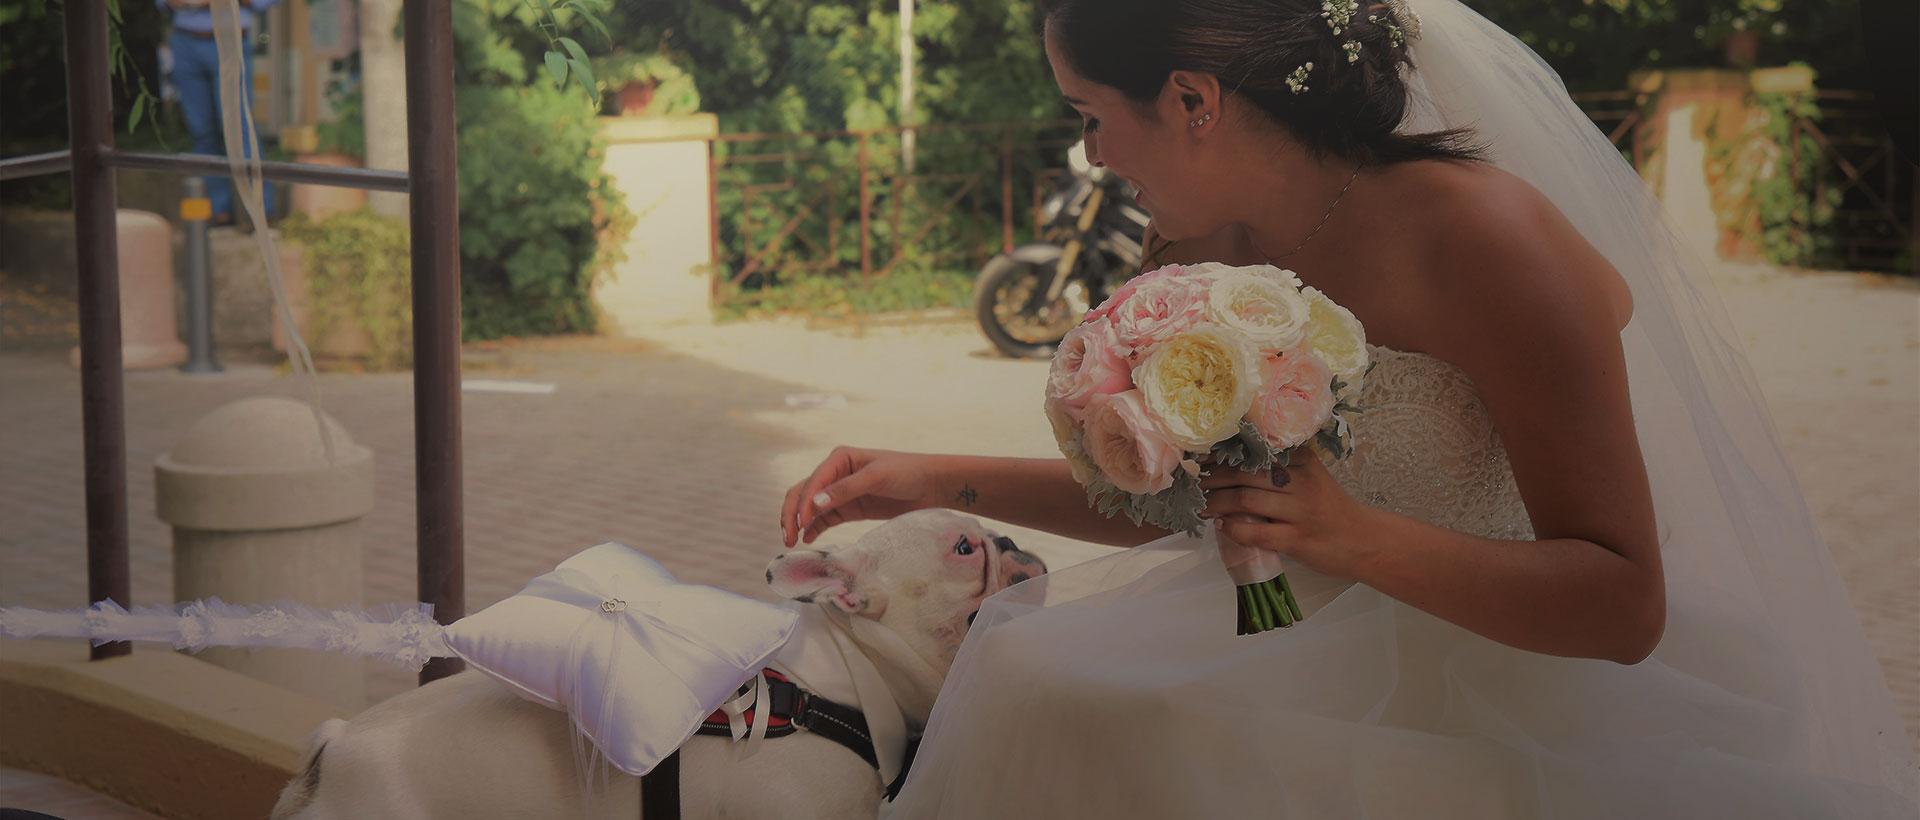 dog sitting matrimoni